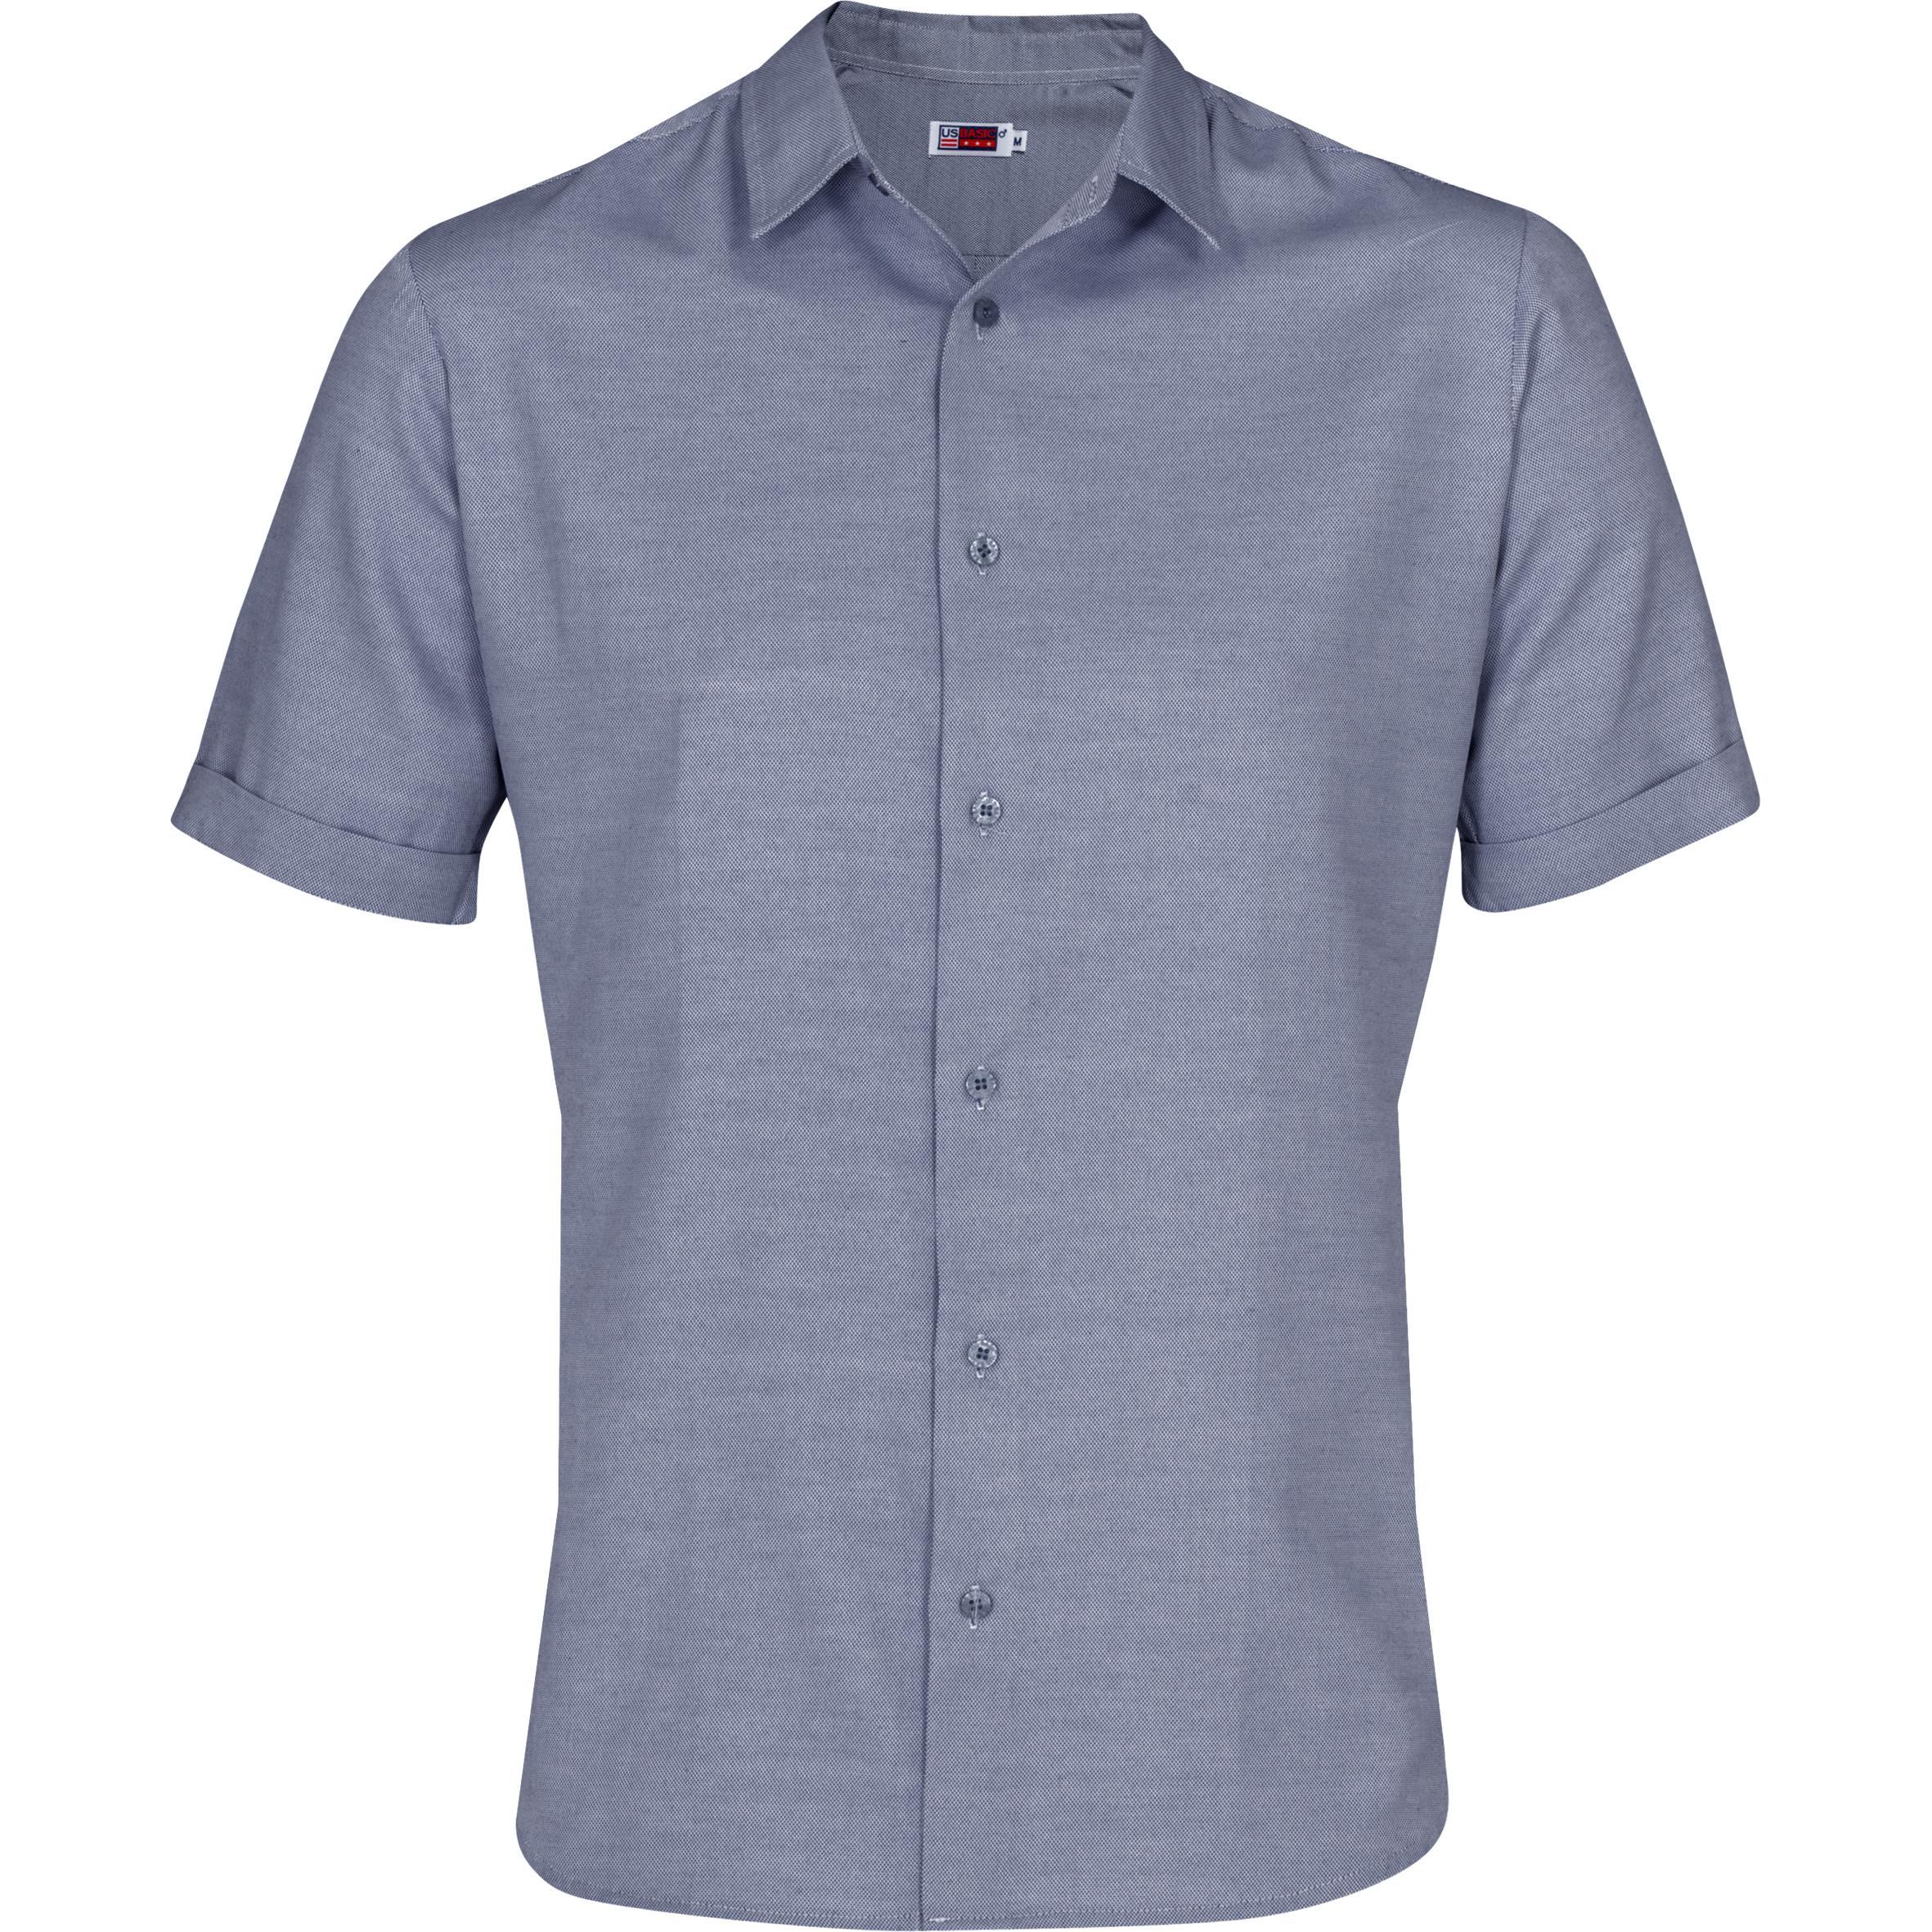 Mens Short Sleeve Wallstreet Shirt